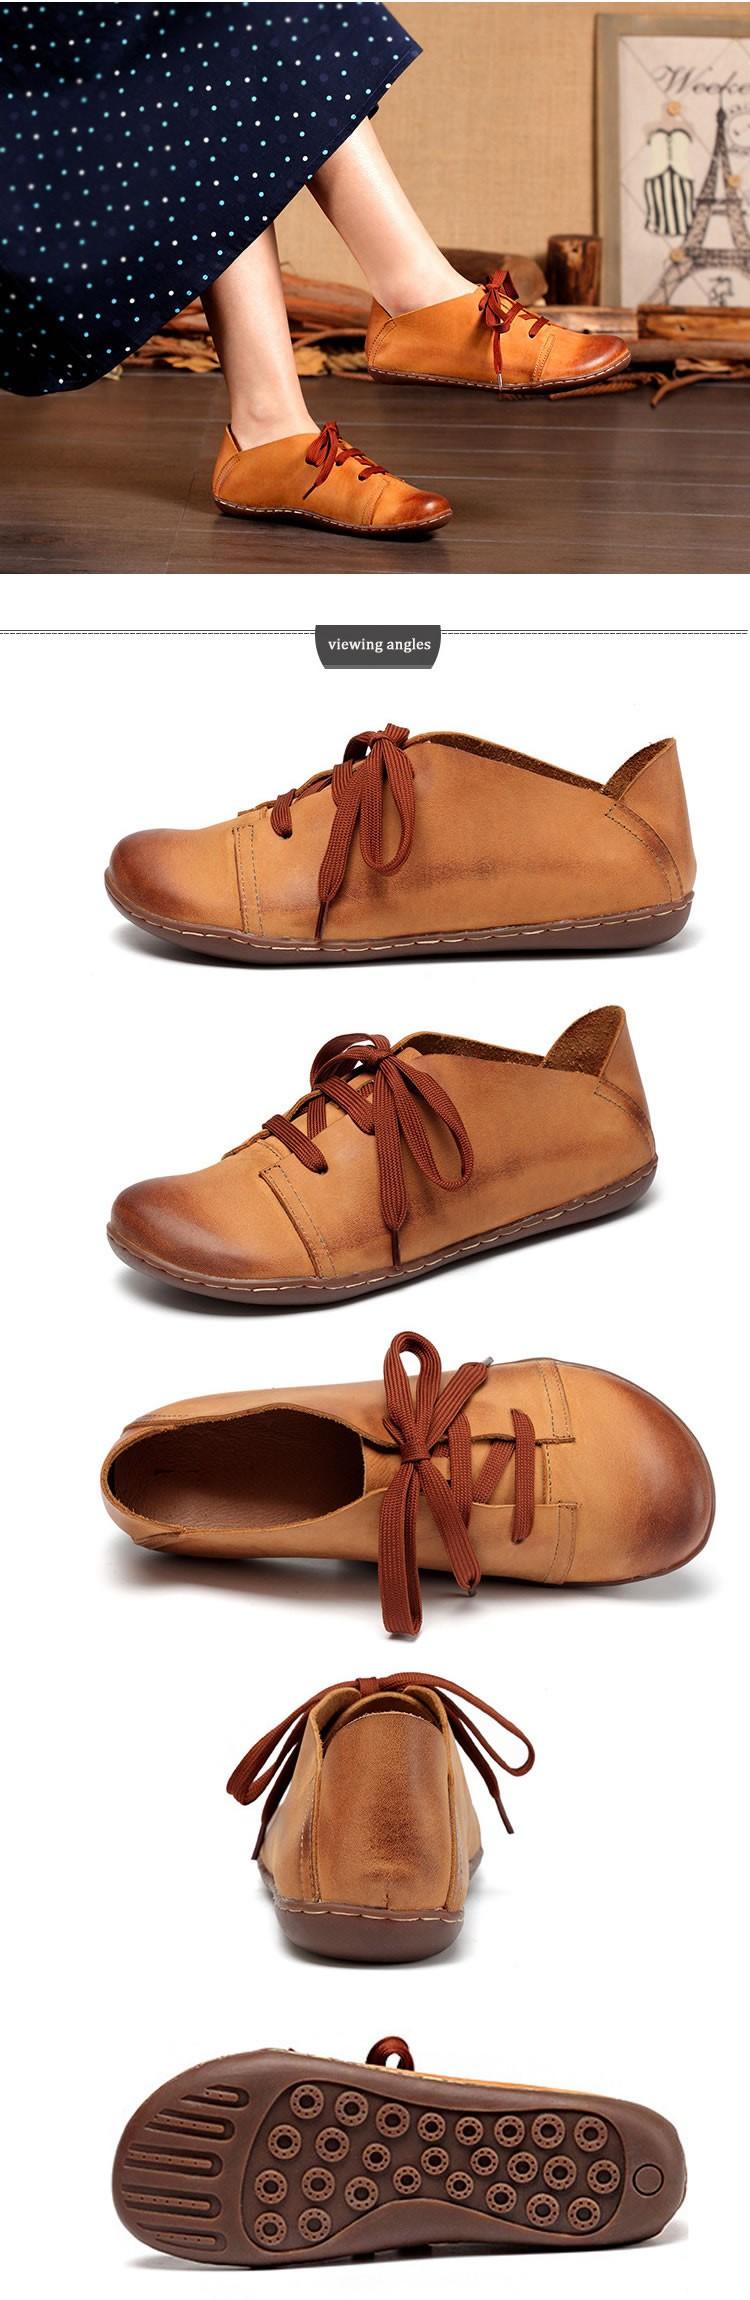 ladies shoes flats